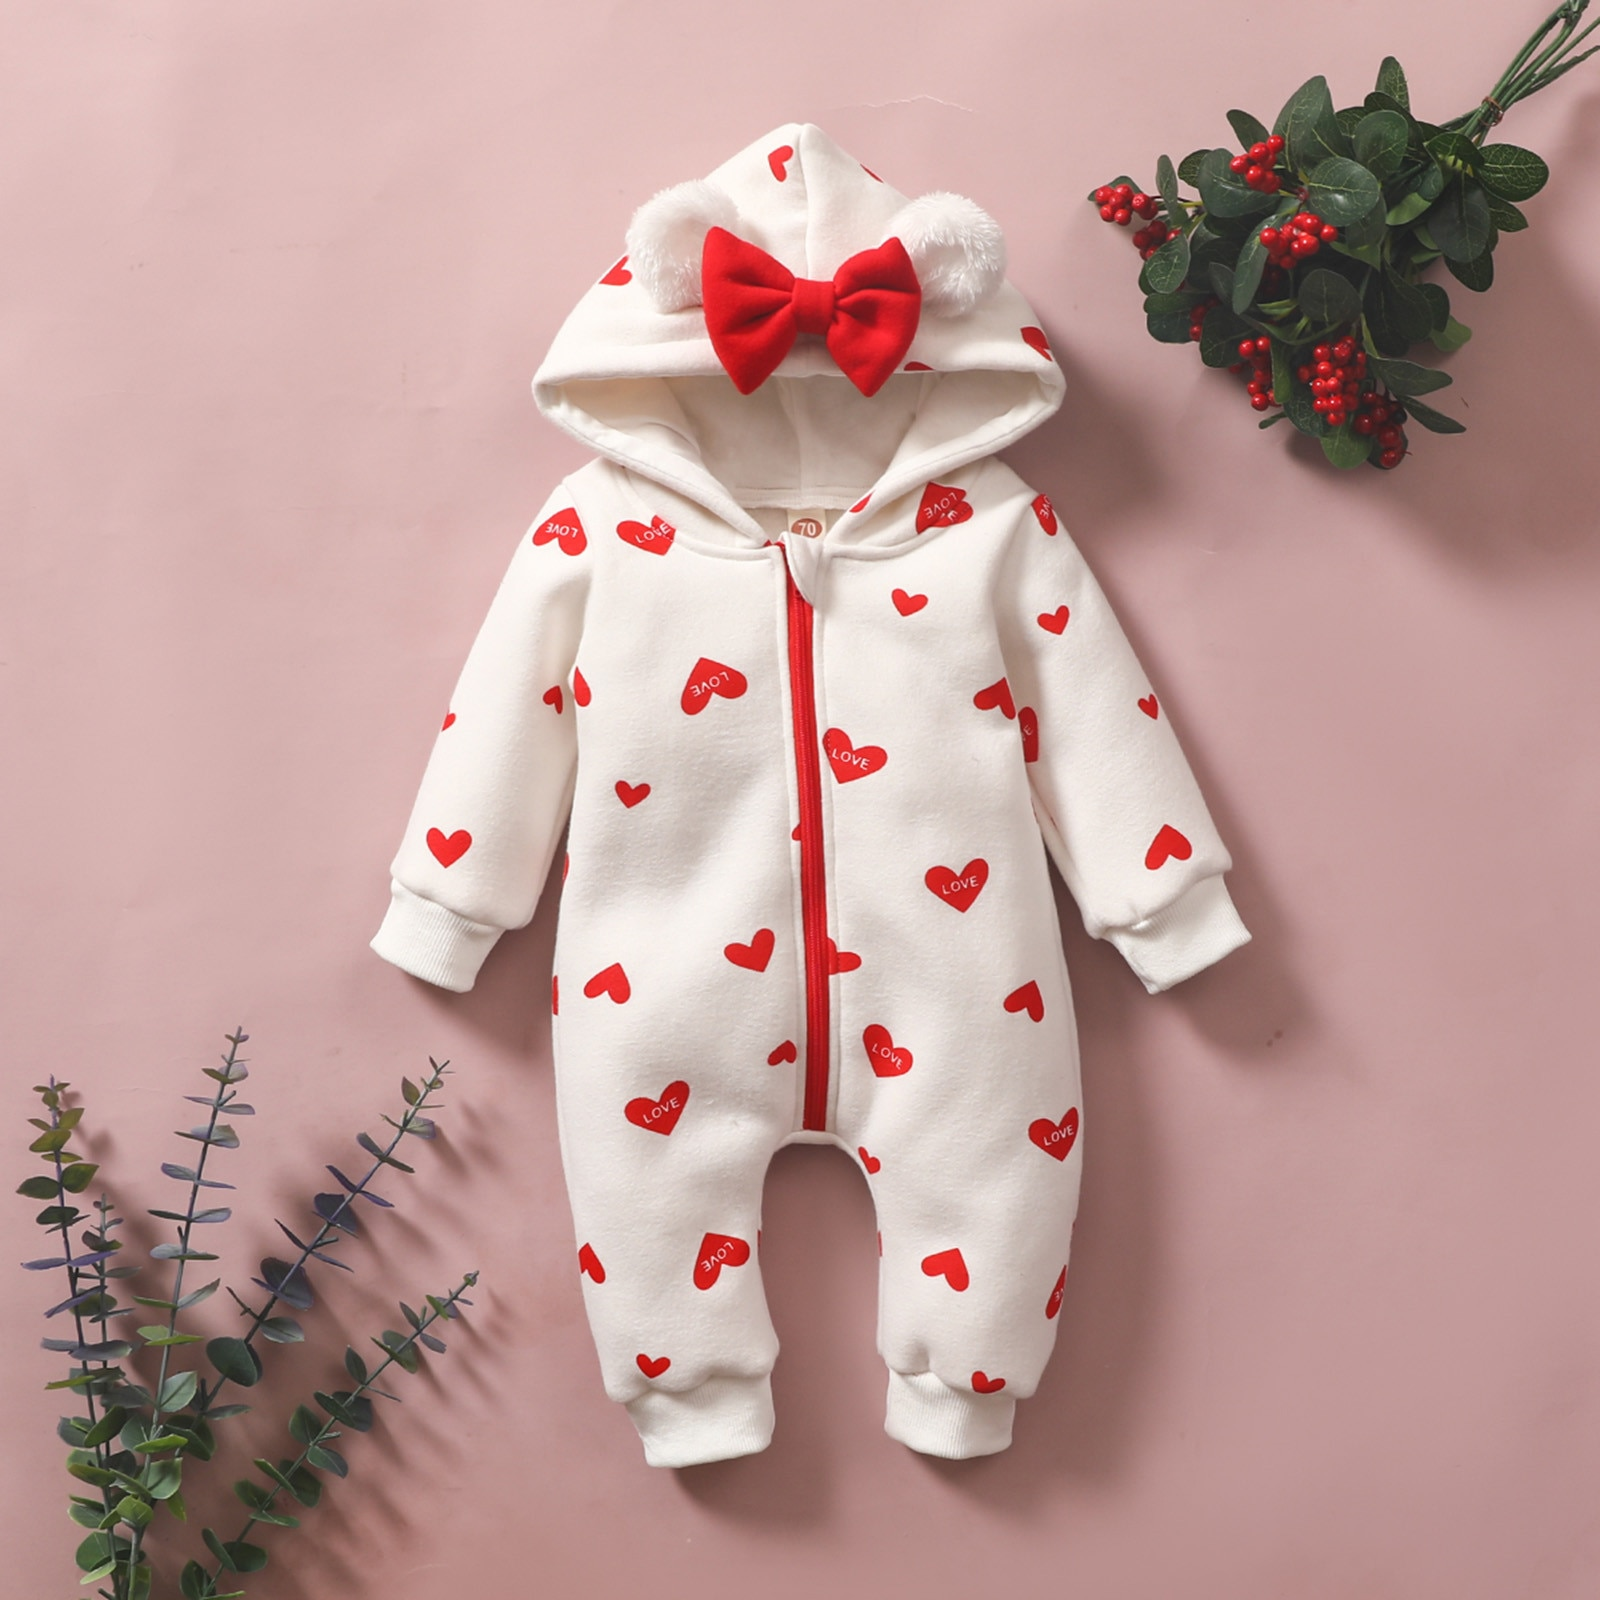 Newborn pajamas home service baby girl cartoon heart-shaped print princess jumpsuit romper pajamas слипы для новорожденных 6*